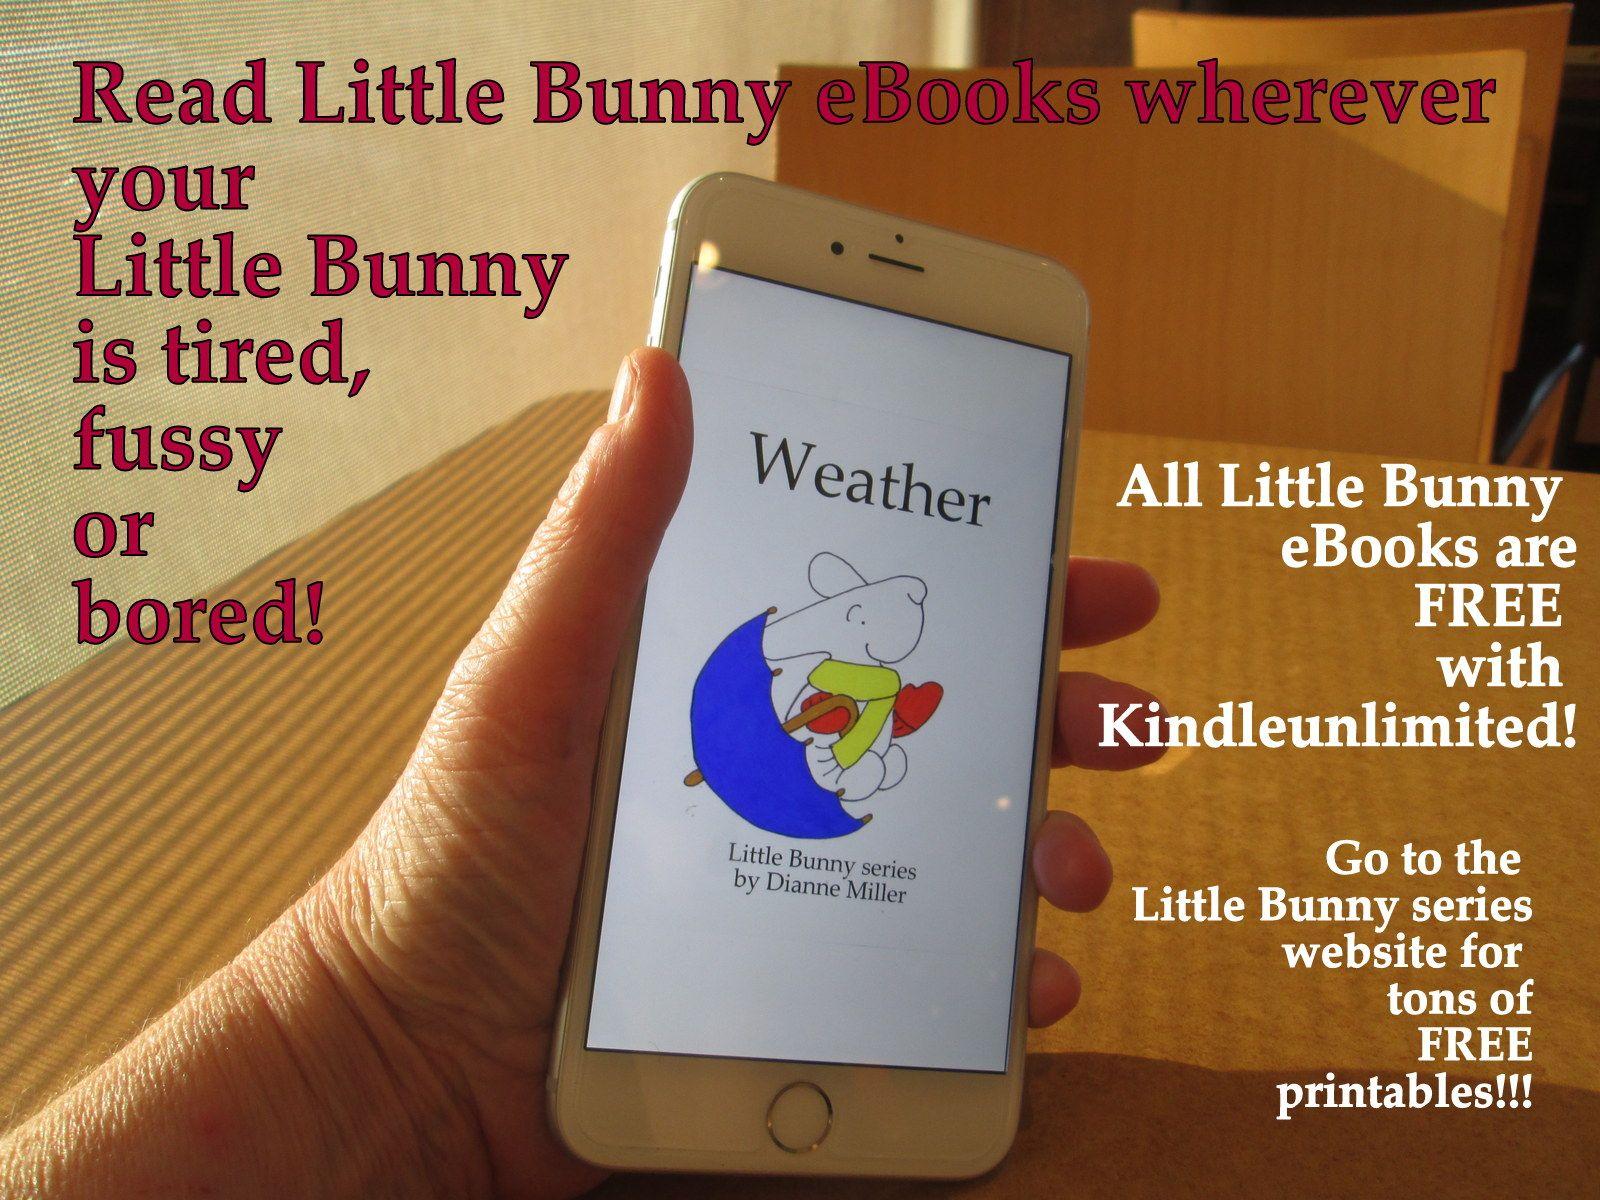 Over 200 Free Printables At Littlebunnyseries Wordpress